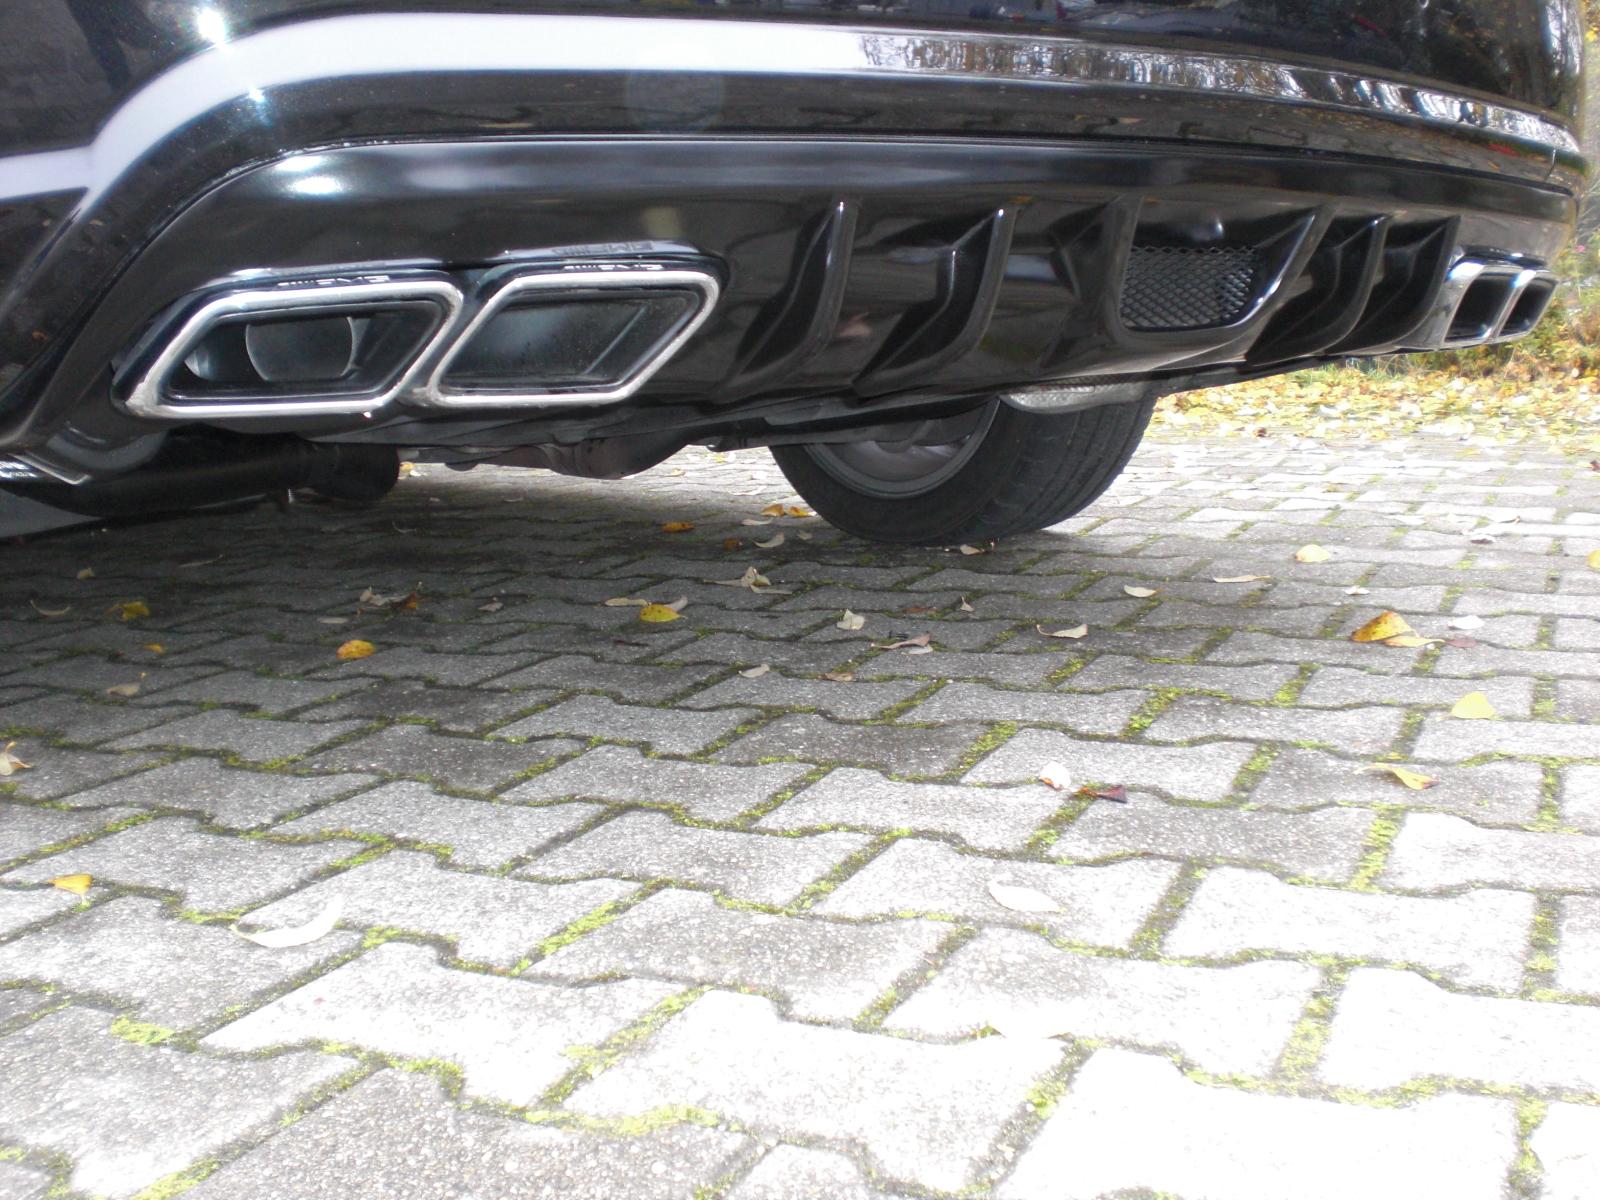 AMG 63 Sportendrohr Styling E-Klasse W207 goeckel automobilveredelung